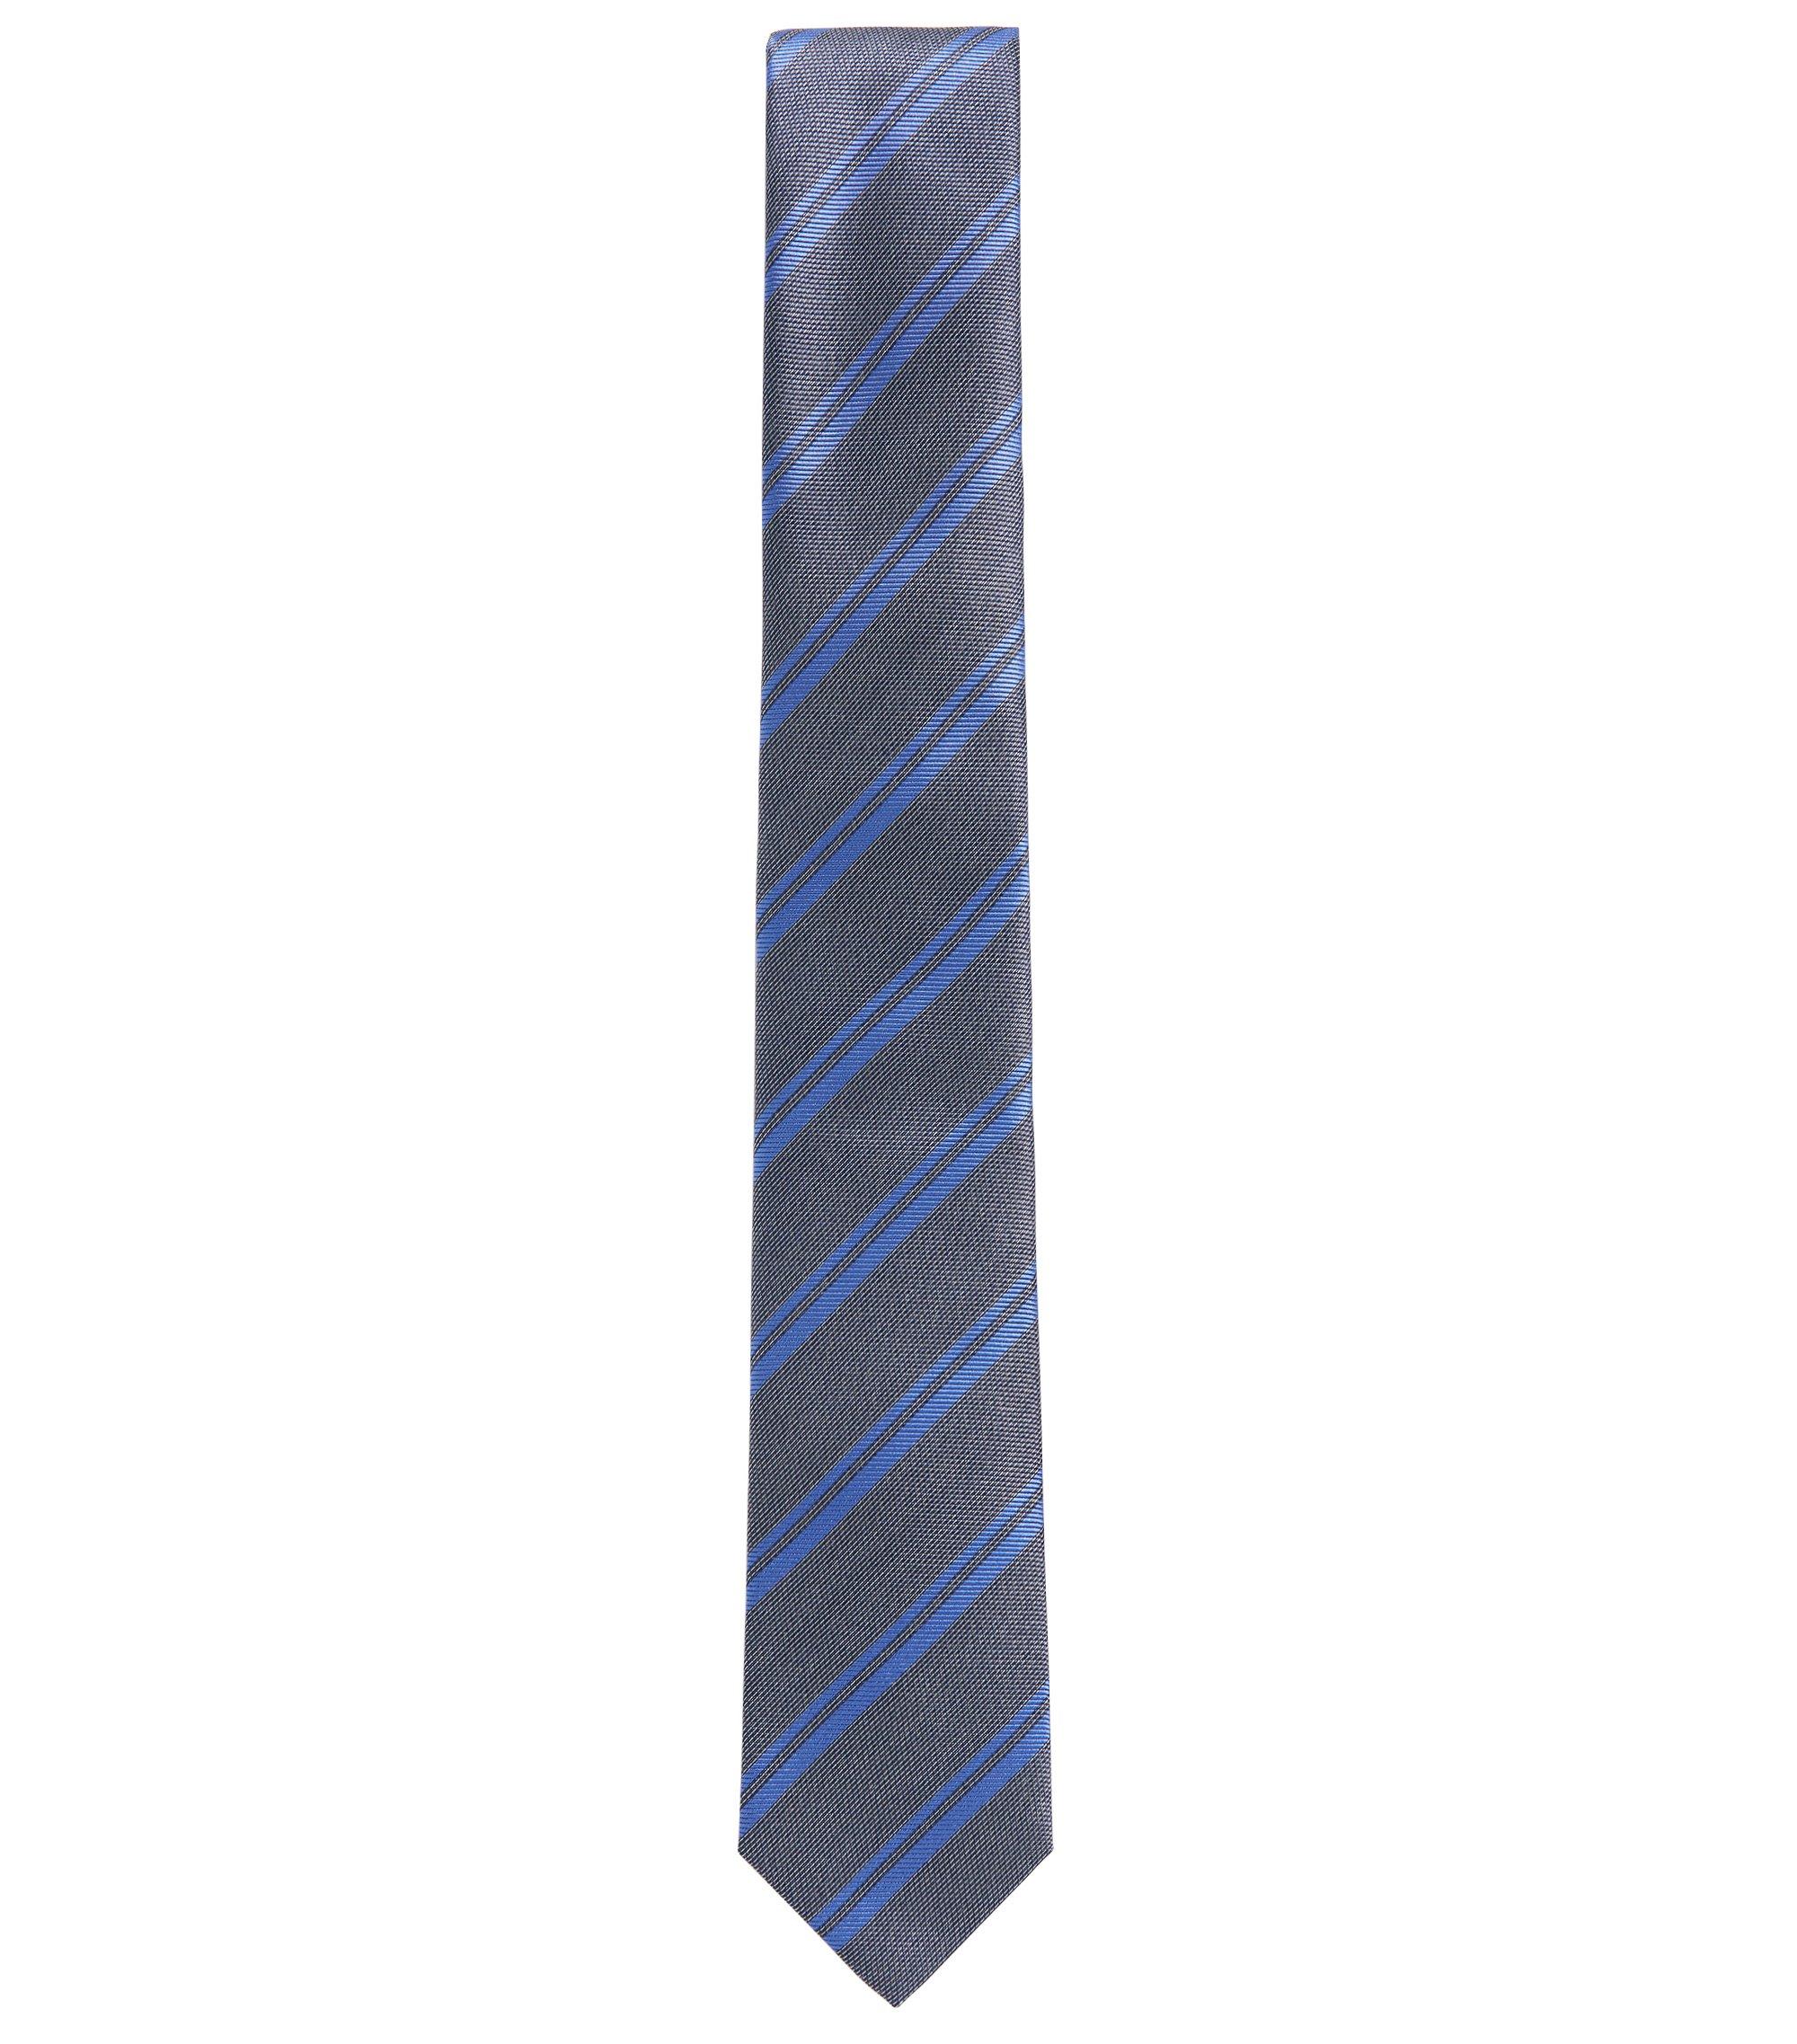 BOSS Tailored Striped Italian Silk Tie, Blue